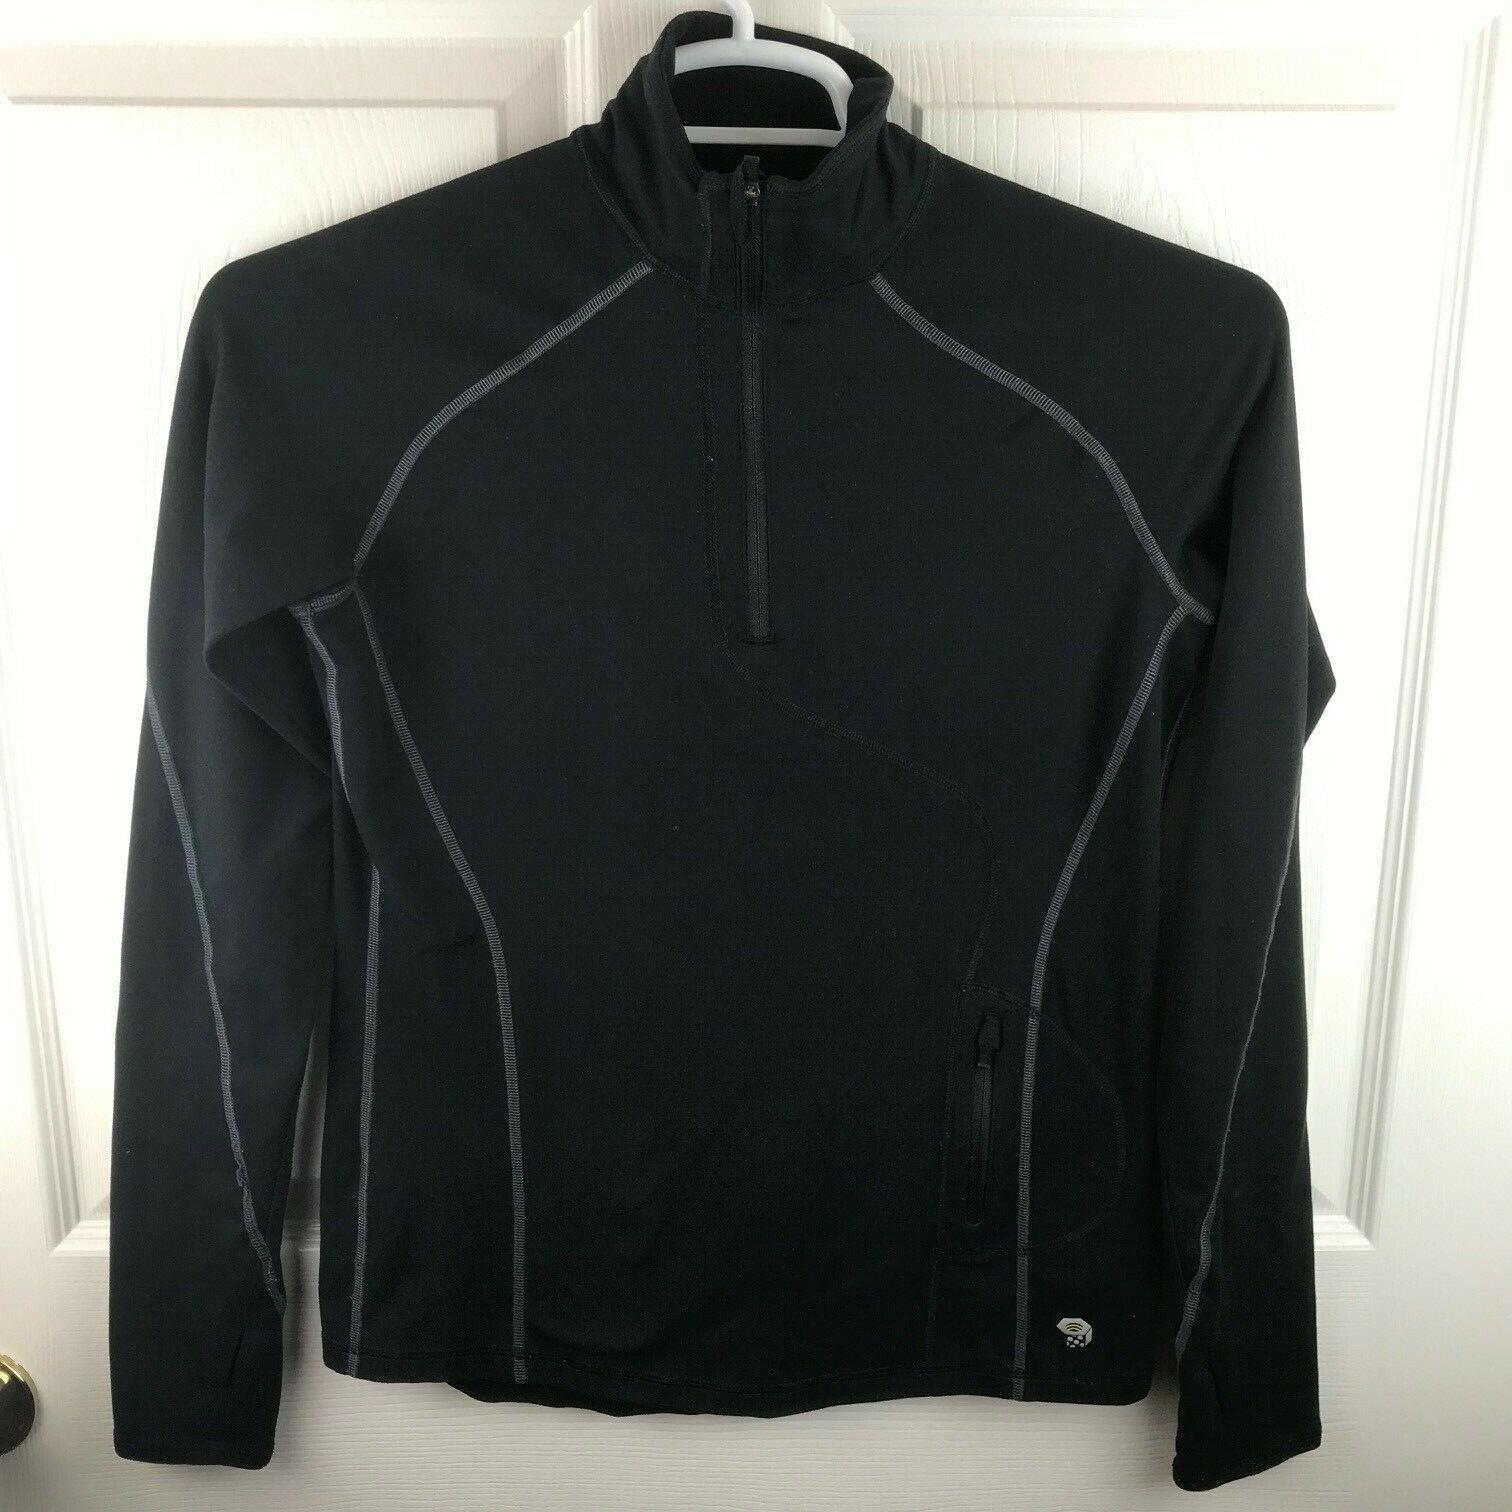 Women's Mountain Hardwear Long Sleeve 1/2 Zip Black Shirt Size Small